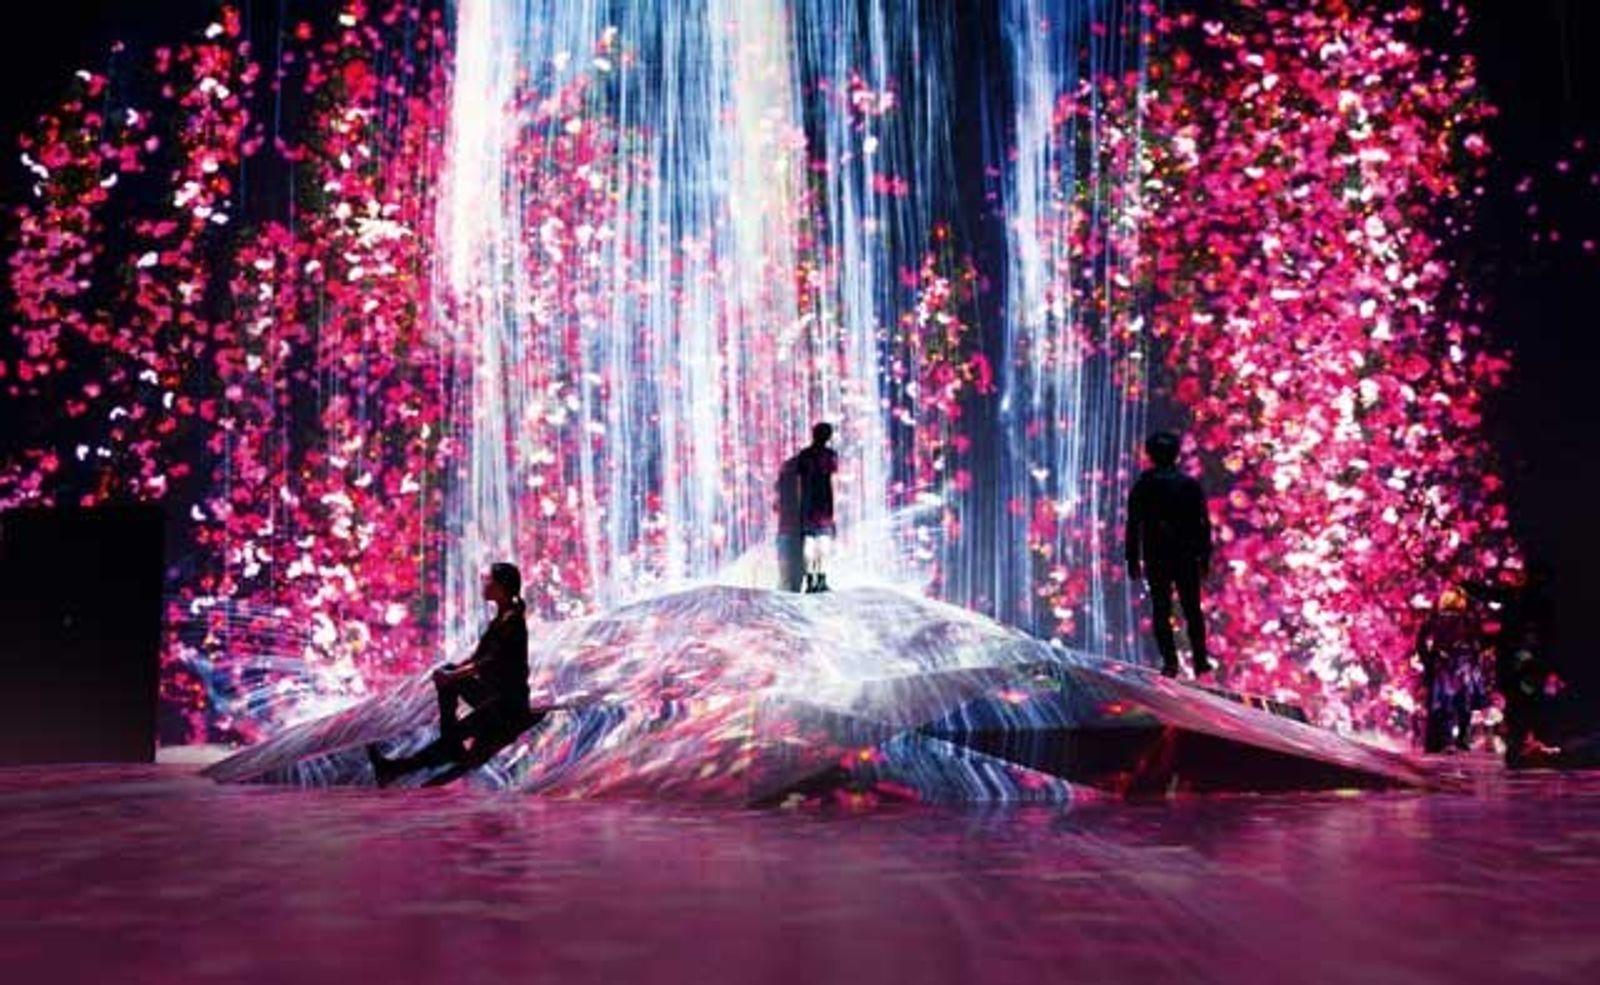 Let's get digital: welcome to Tokyo's new art museum